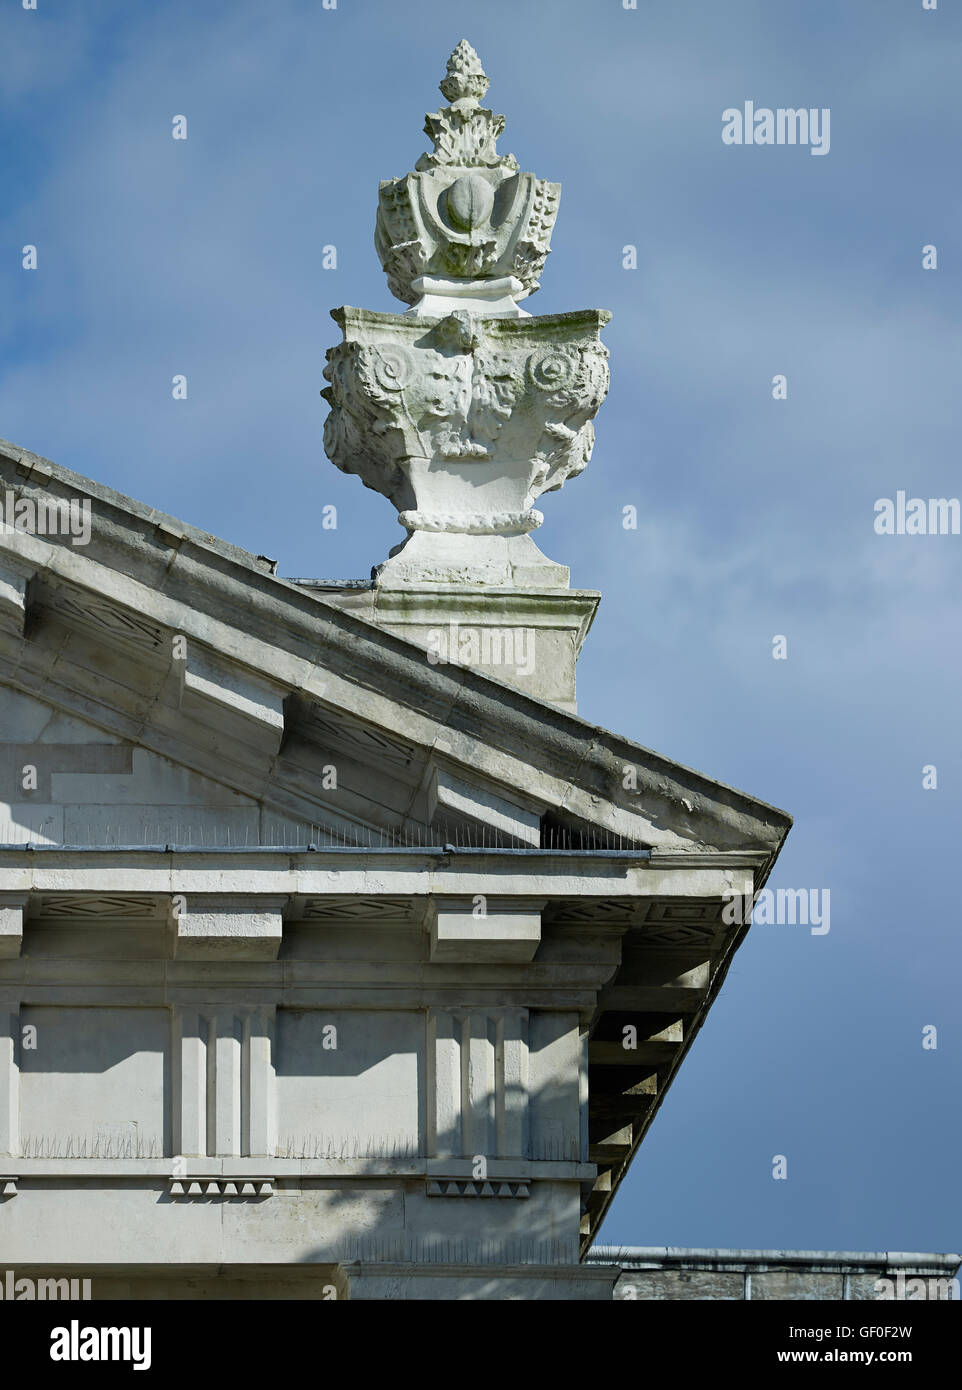 Saint Alfege Greenwich, pediment and urn. Built by Nicholas Hawksmoor 1712-18. Stock Photo